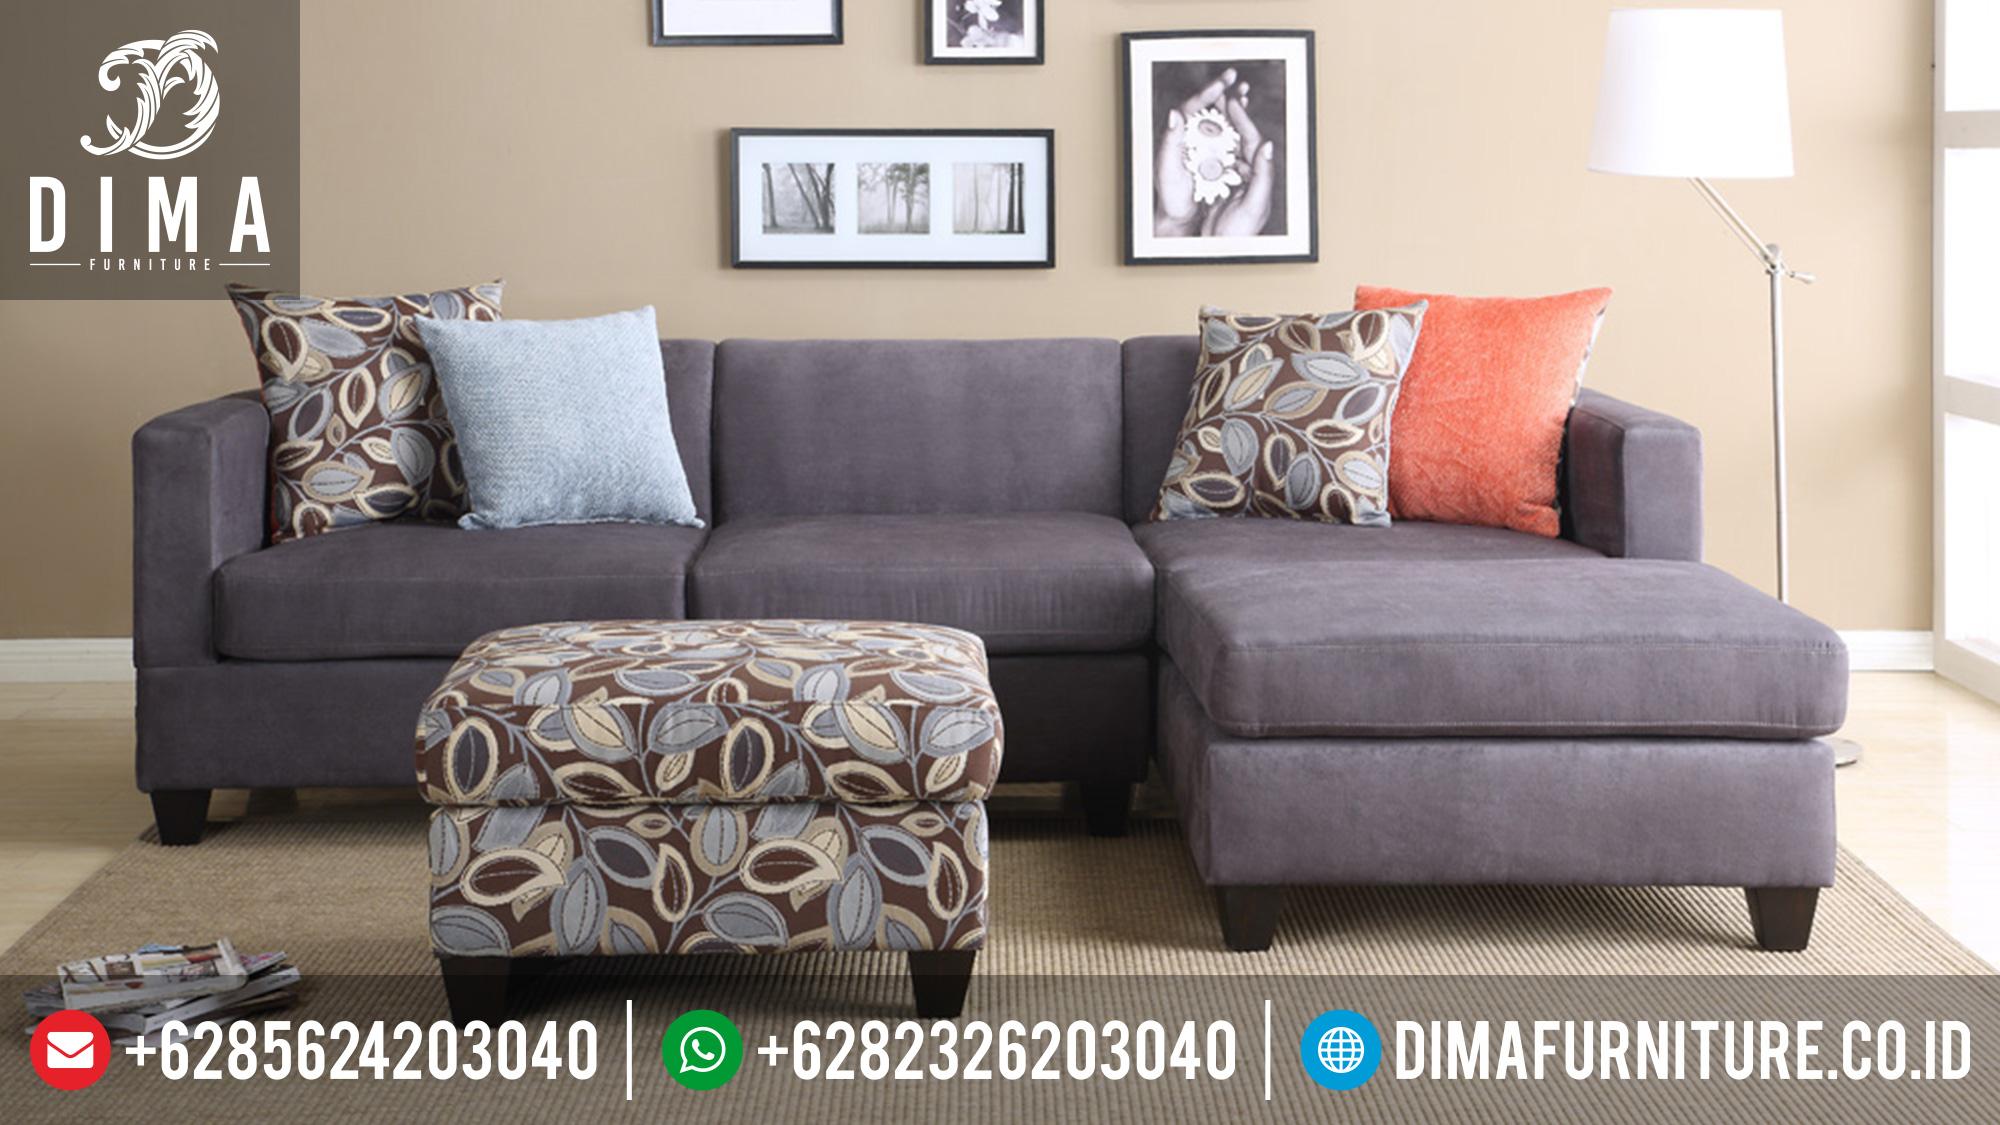 Sofa Sudut L Minimalis Modern, Sofa Tamu Minimalis Terbaru, Kursi Sudut Minimalis ST-0381